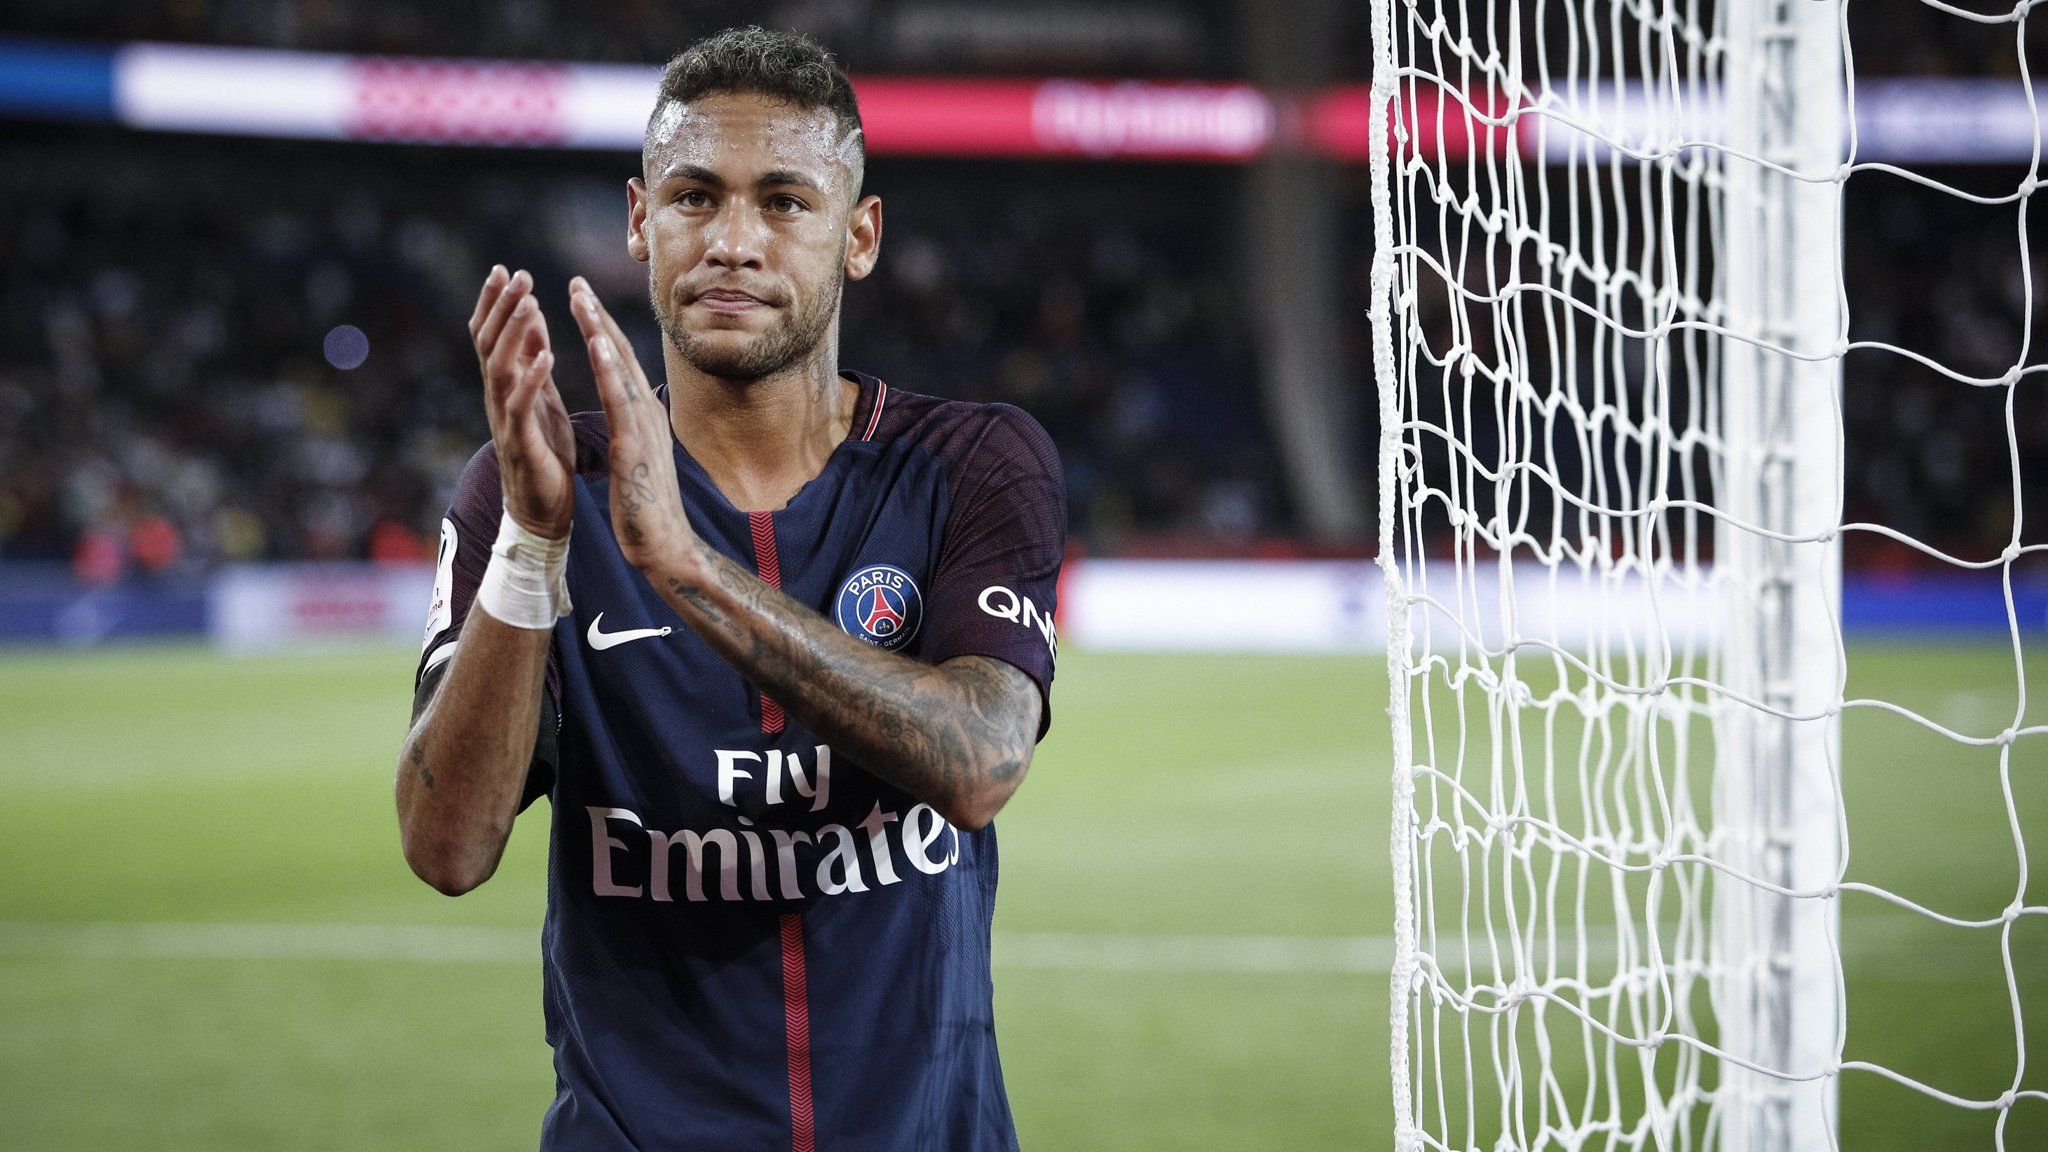 949aa1dd3341e FC Barcelona sues Neymar for €8.5m over PSG transfer   Financial Times